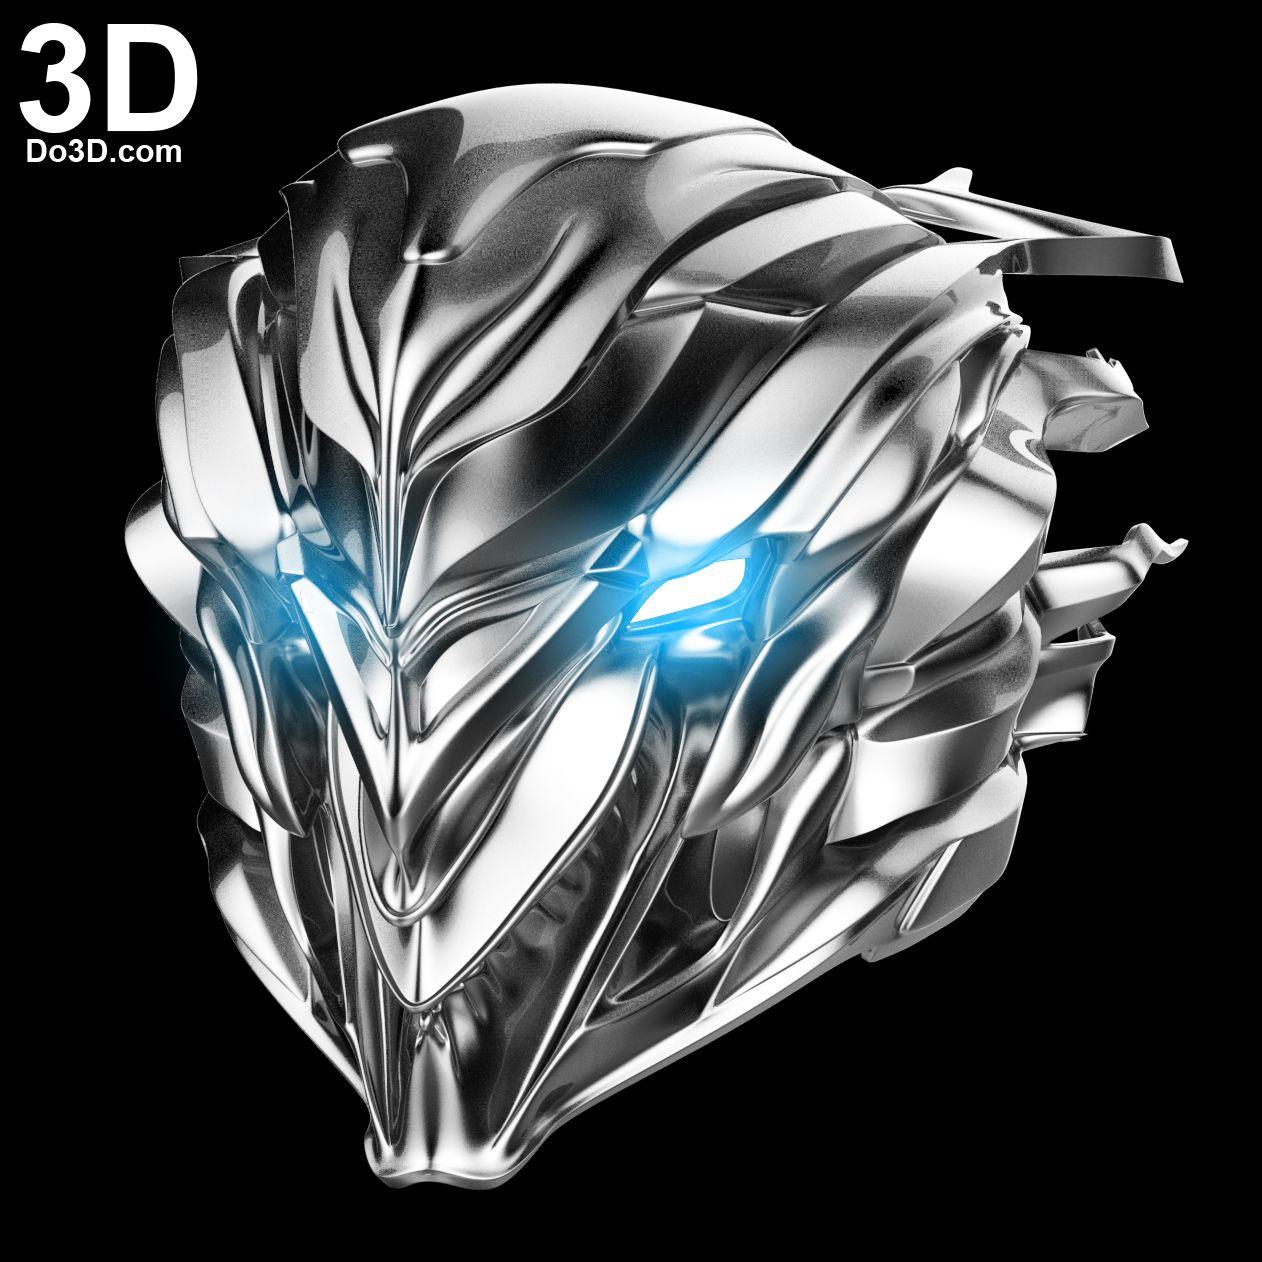 3D Printable Model Savitar Helmet from Flash TV Season 3